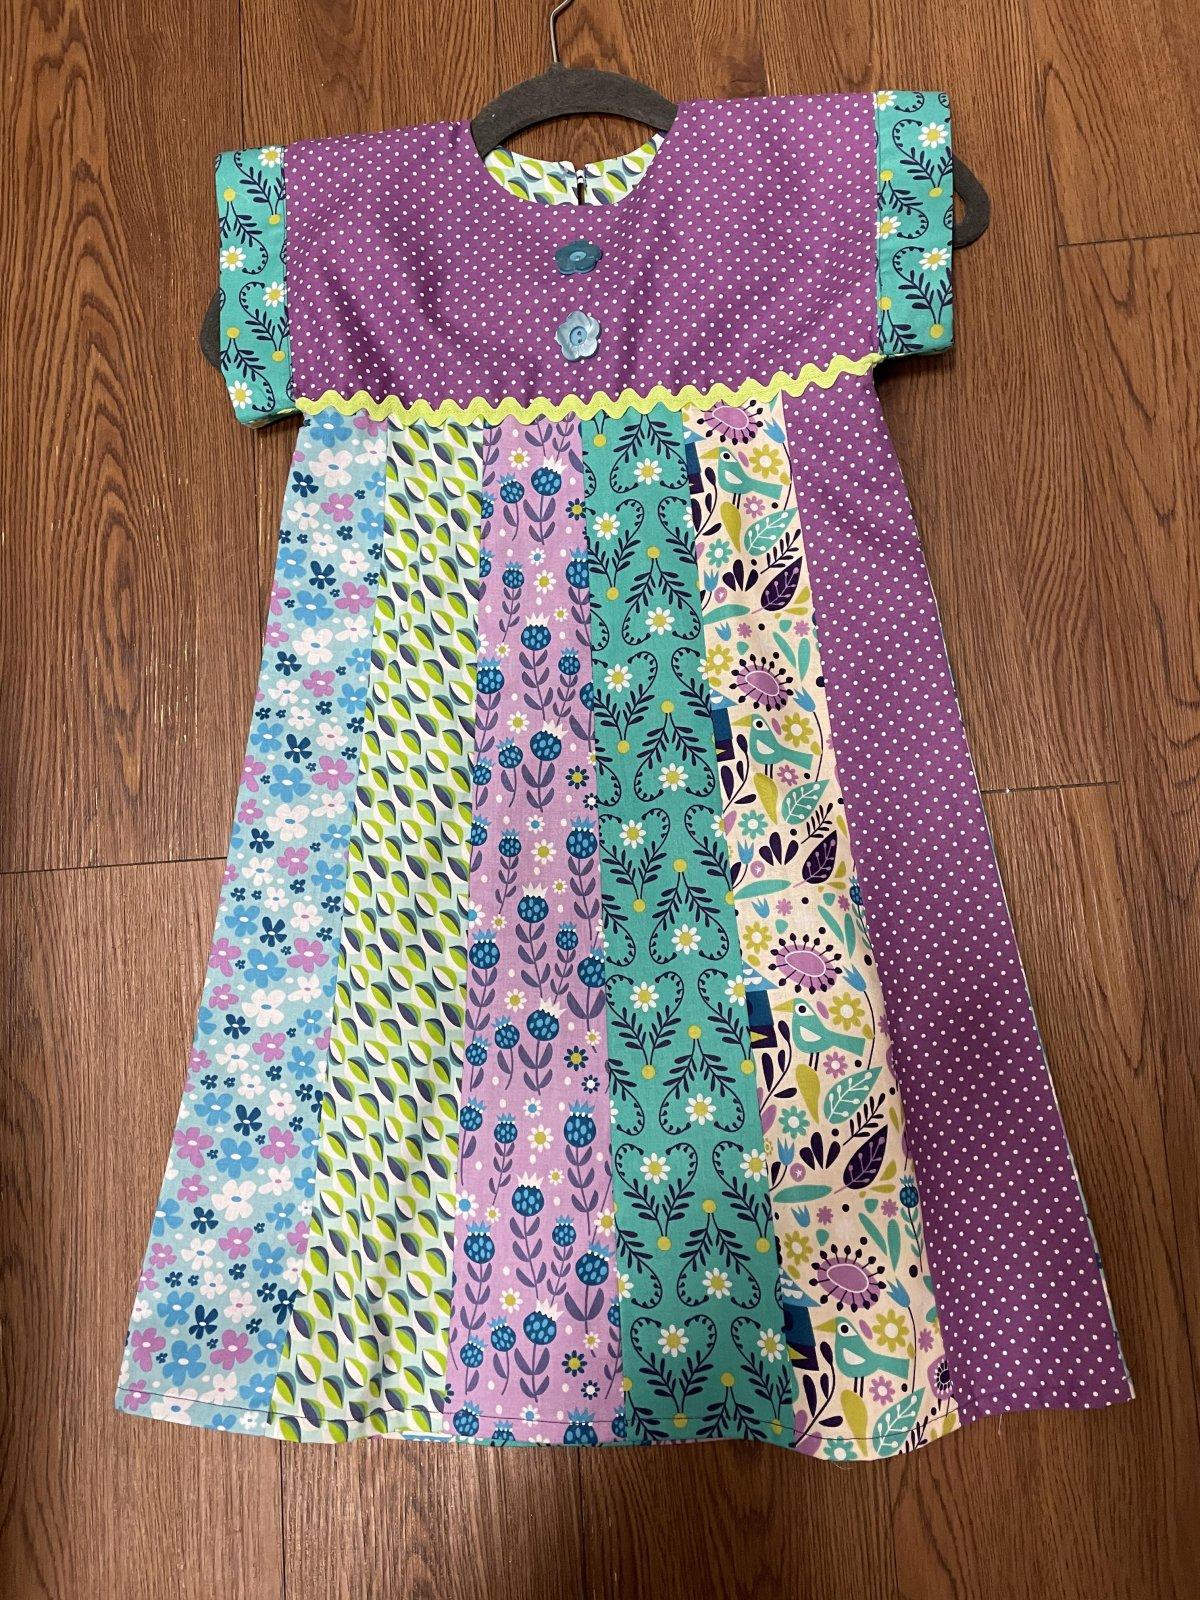 Poppy's Easy Dress!